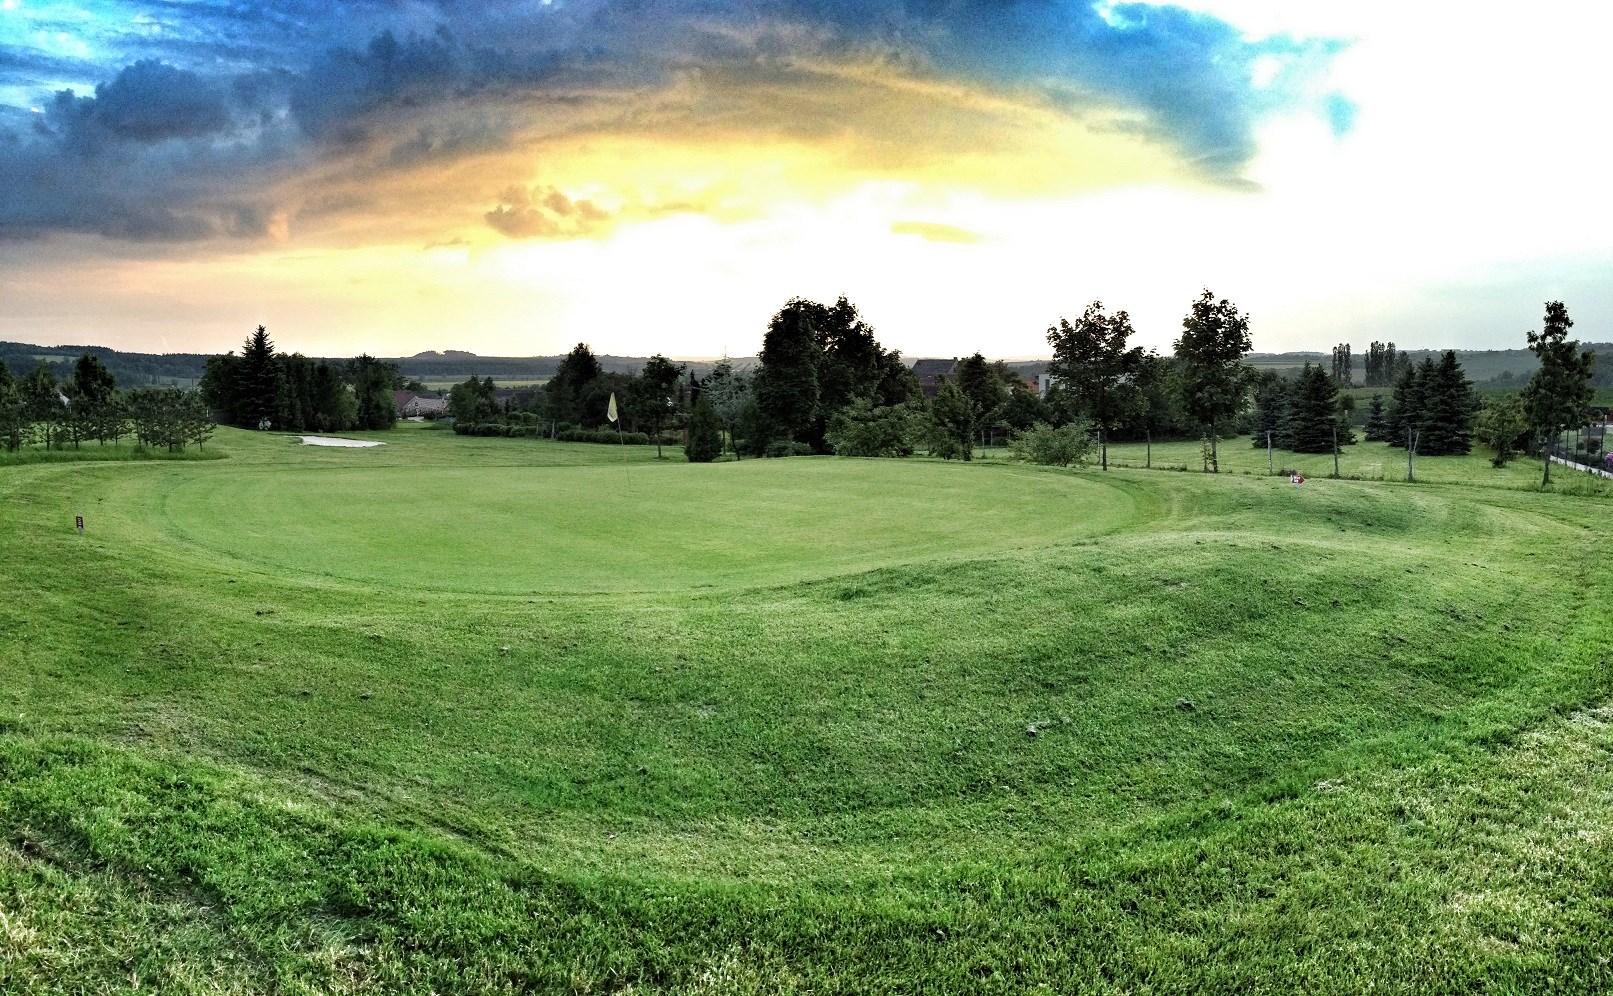 Golf_Horehledy_03.jpg